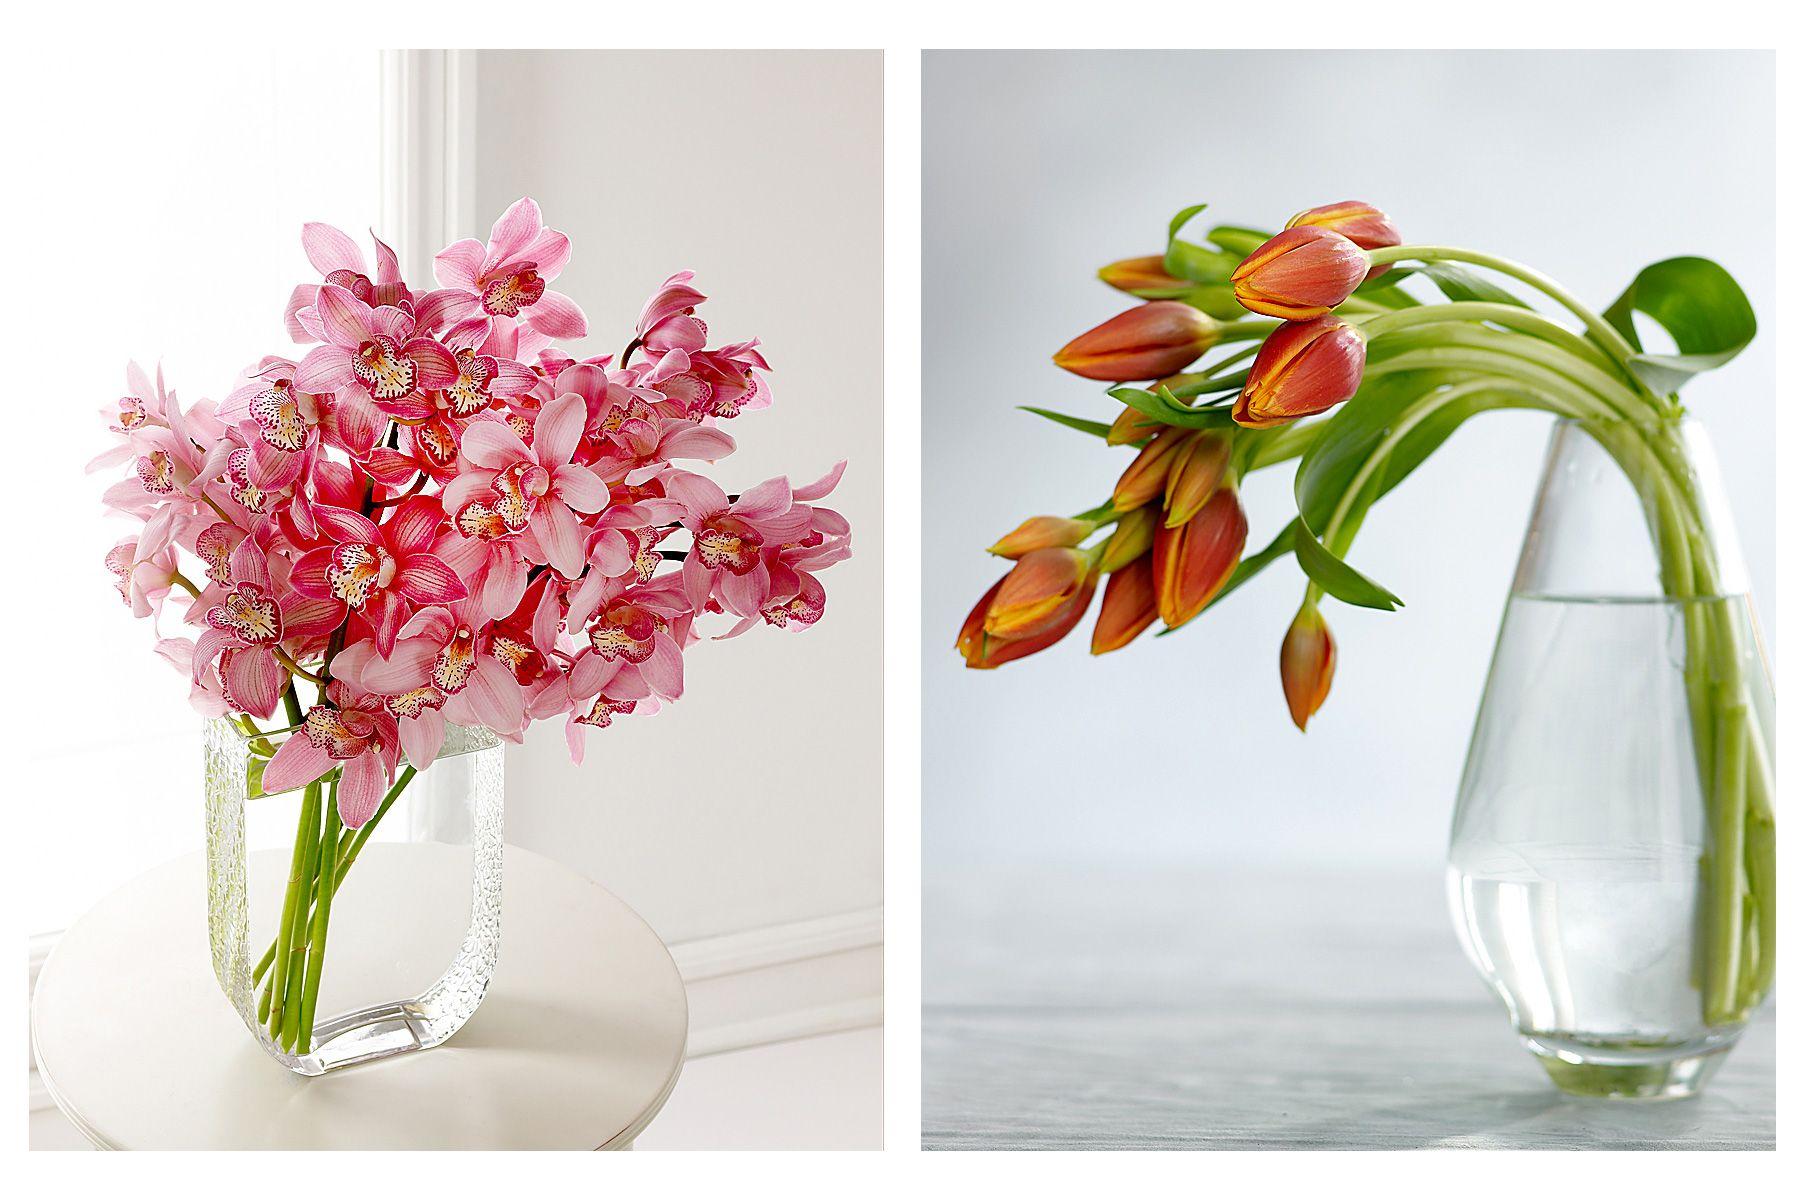 Flowers-#2--2-Images.jpg